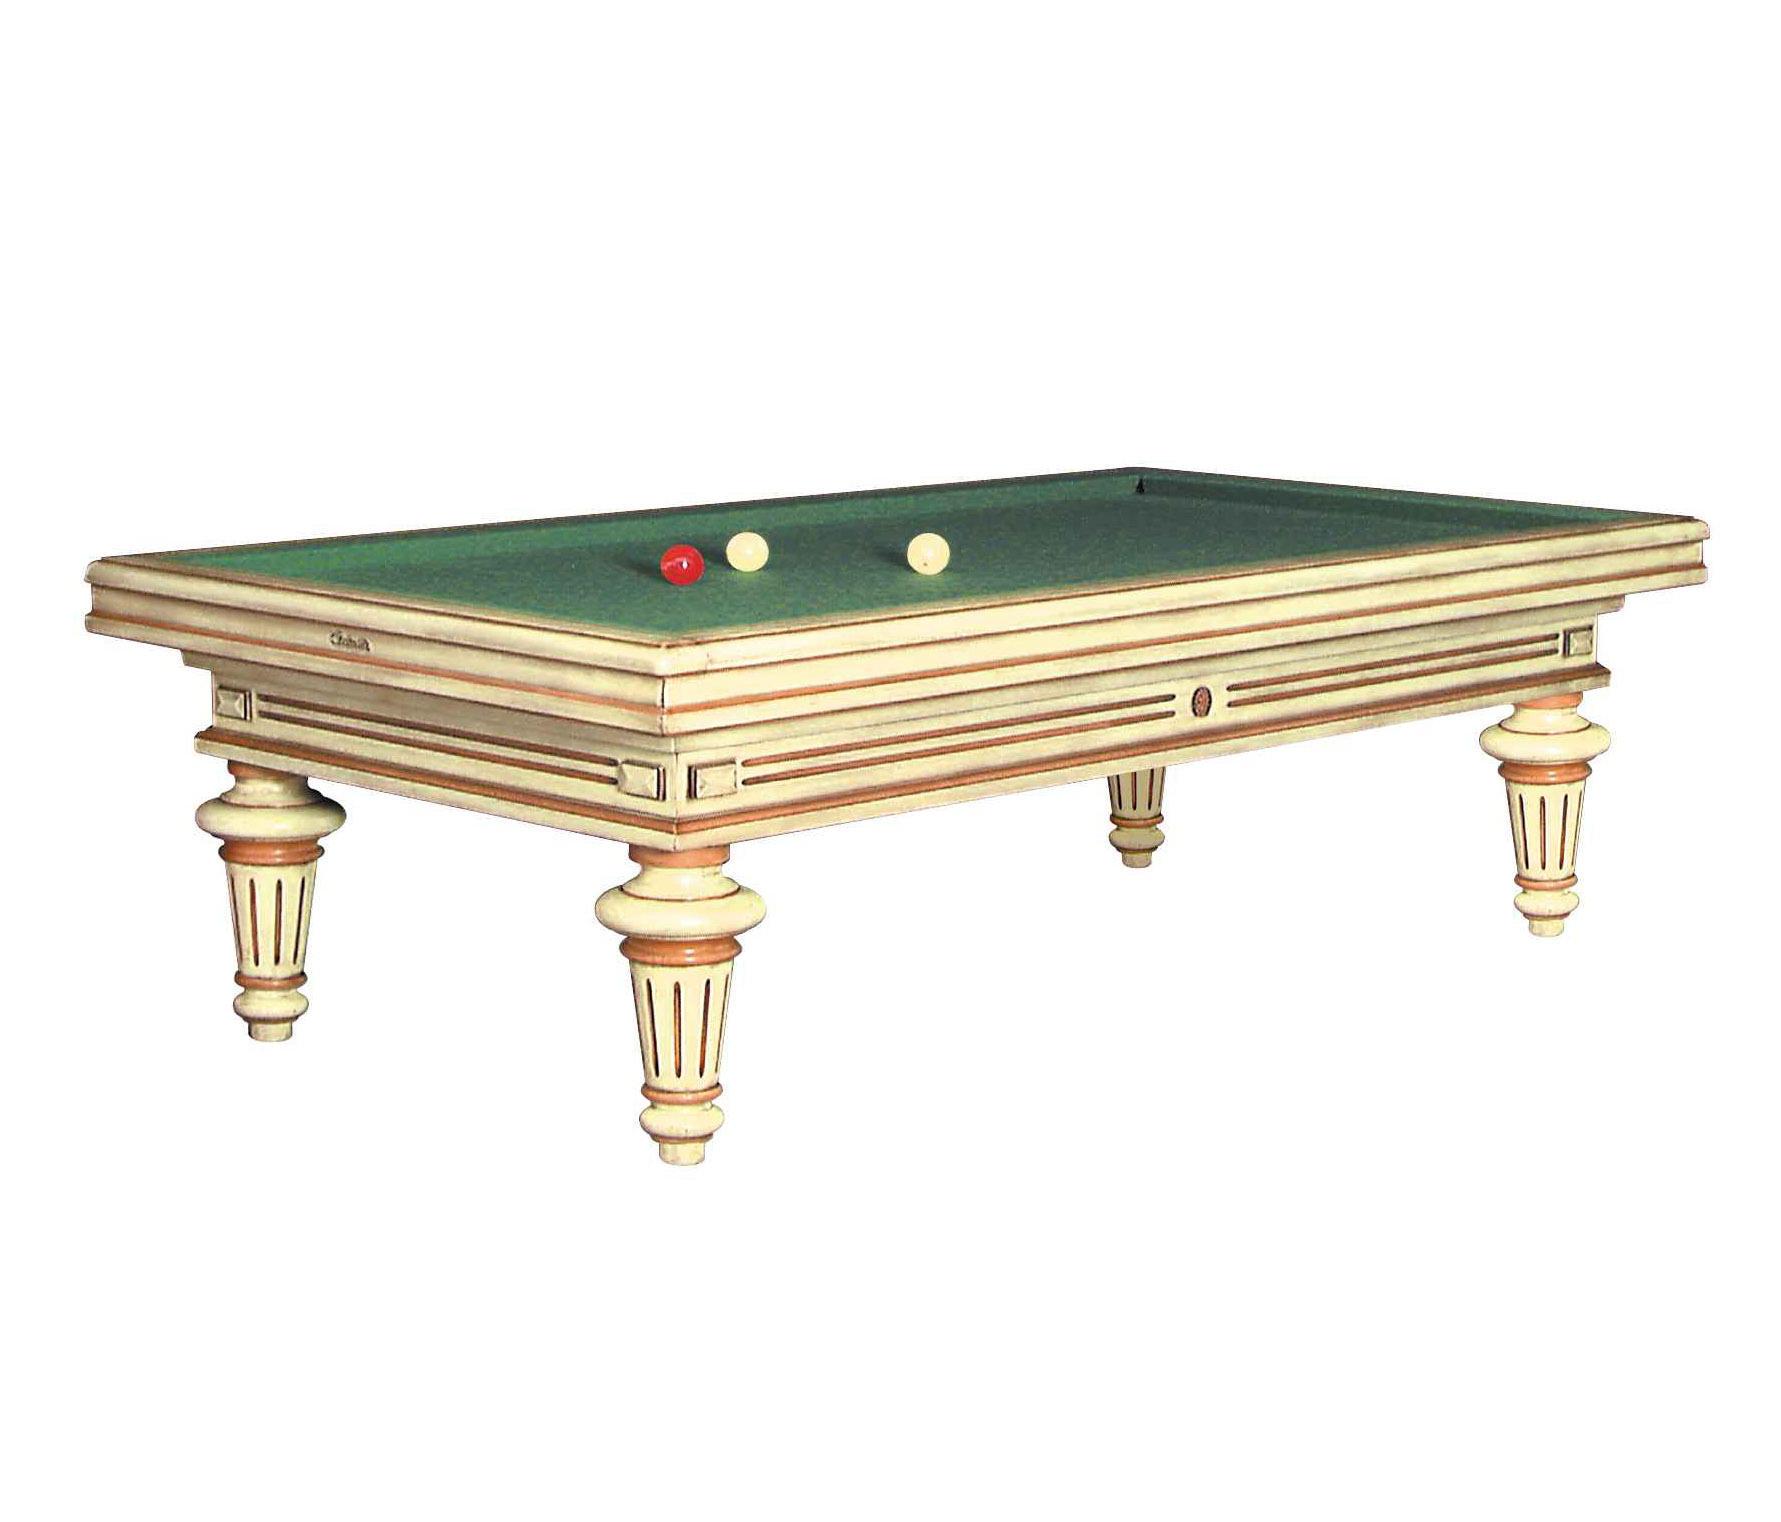 louis xvi prestige tables de jeux de billard de. Black Bedroom Furniture Sets. Home Design Ideas